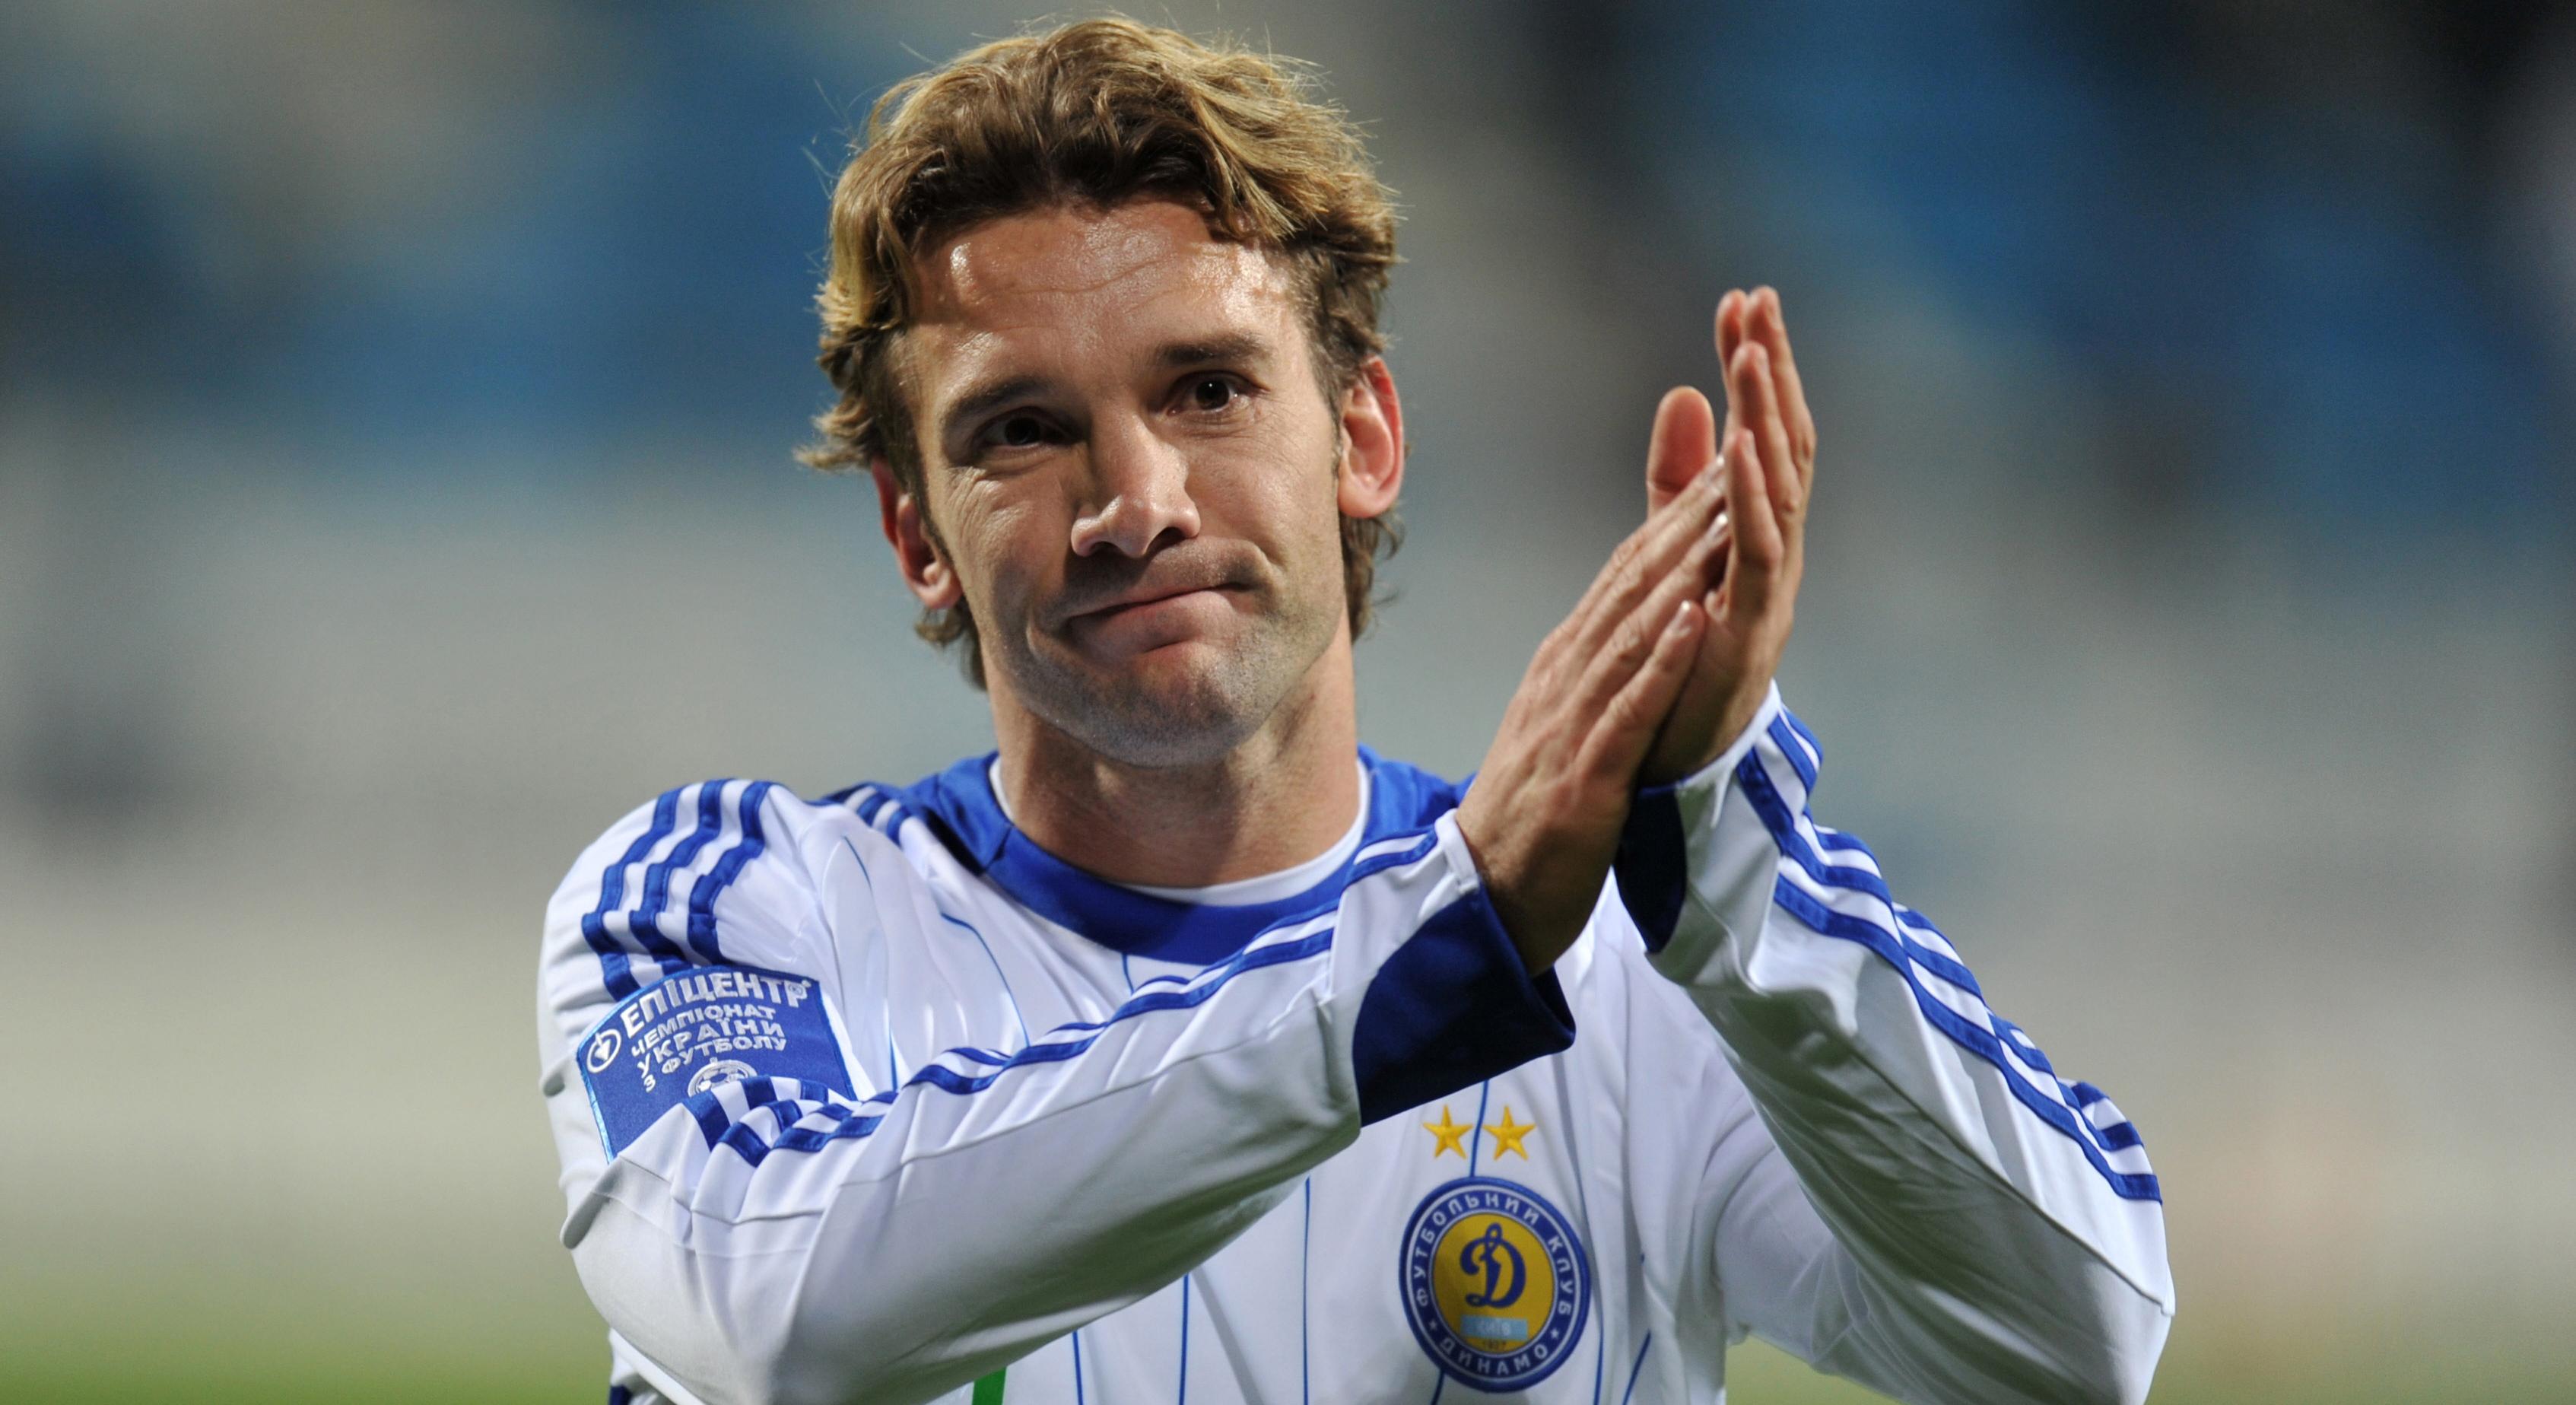 Andriy Shevchenko Dynamo Kyiv